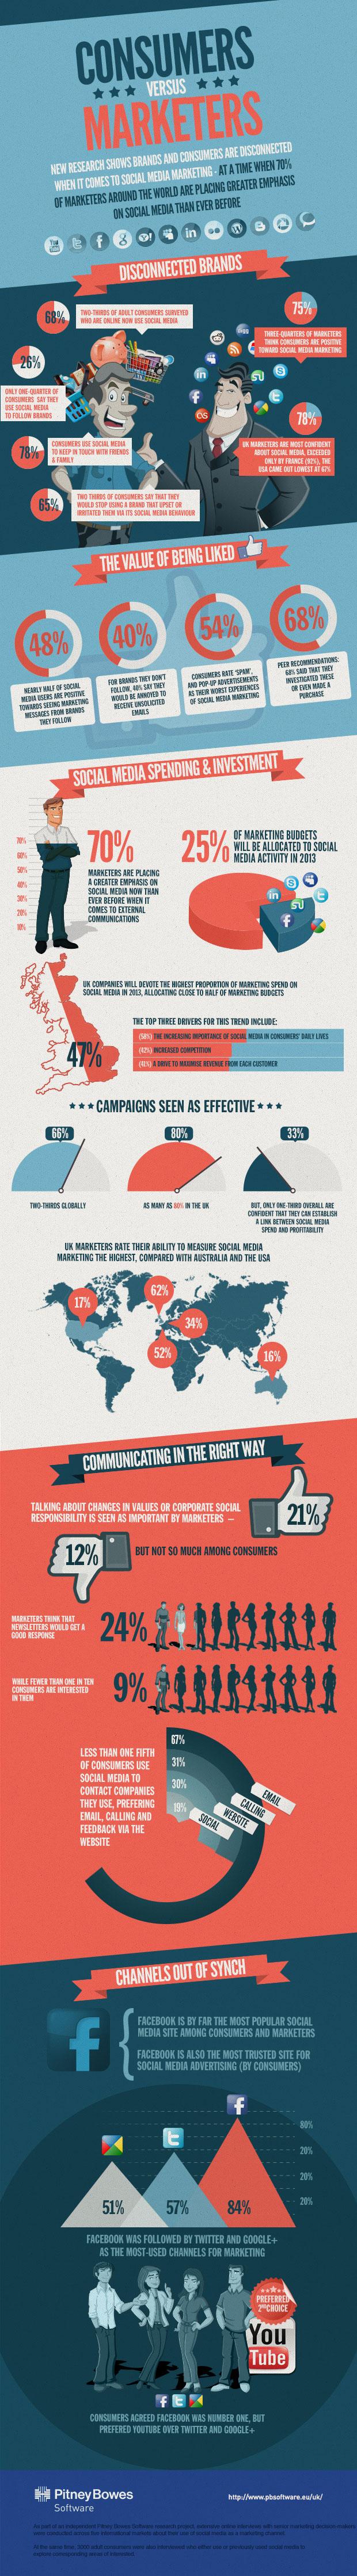 brands-vs-consumers-social-media-disconnect